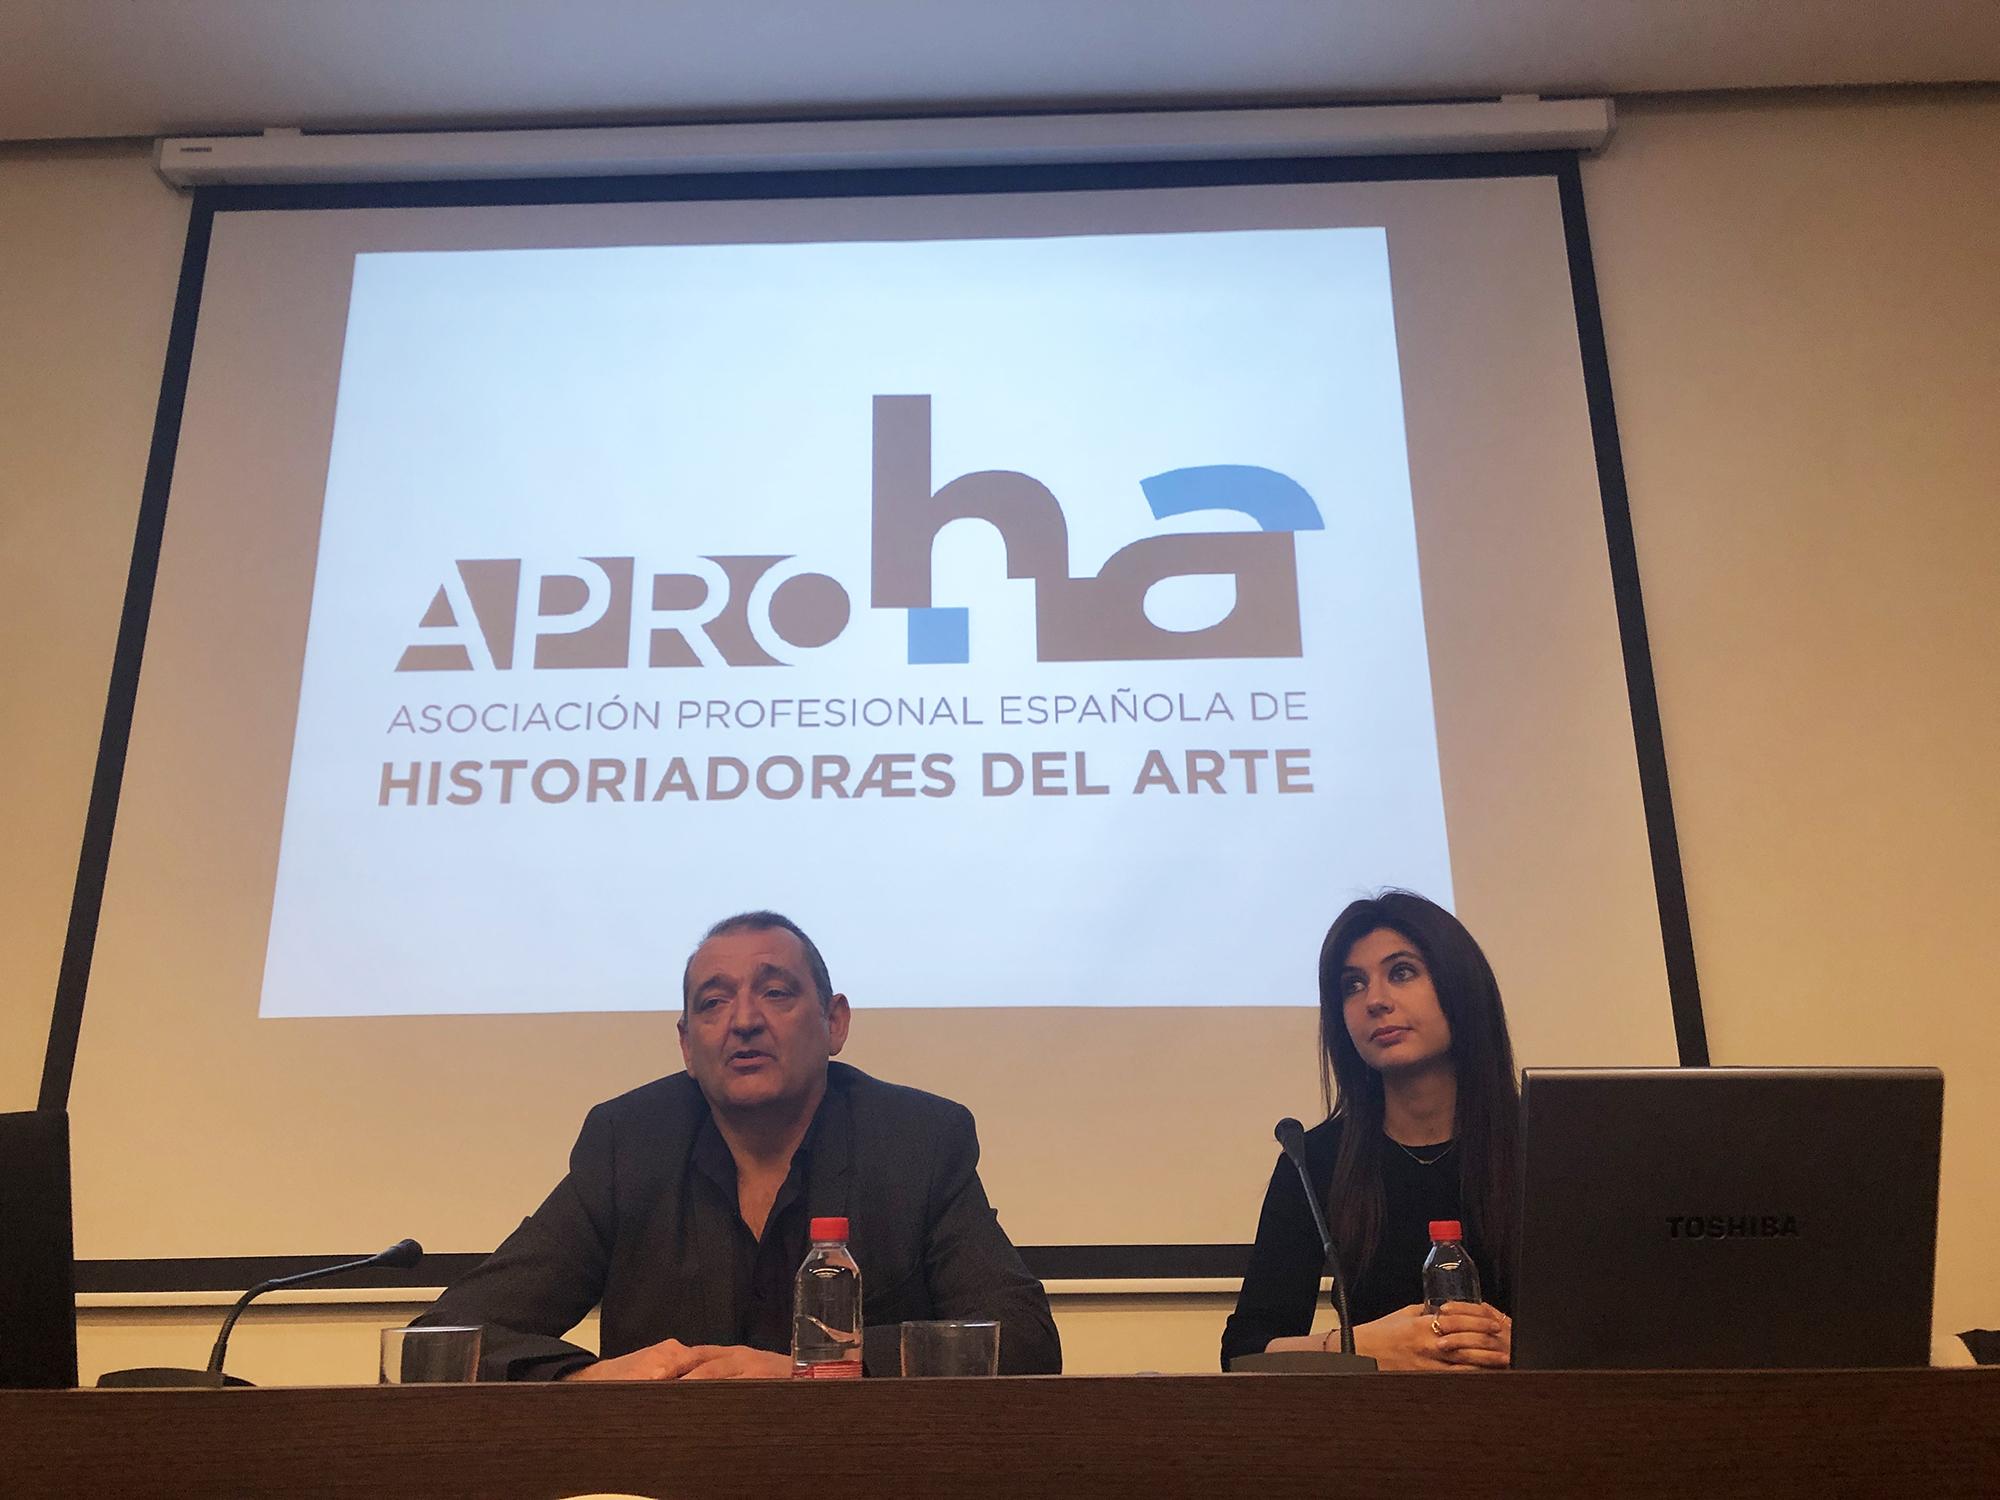 Jornadas sobre historia del arte, aproha, culturina comunicación